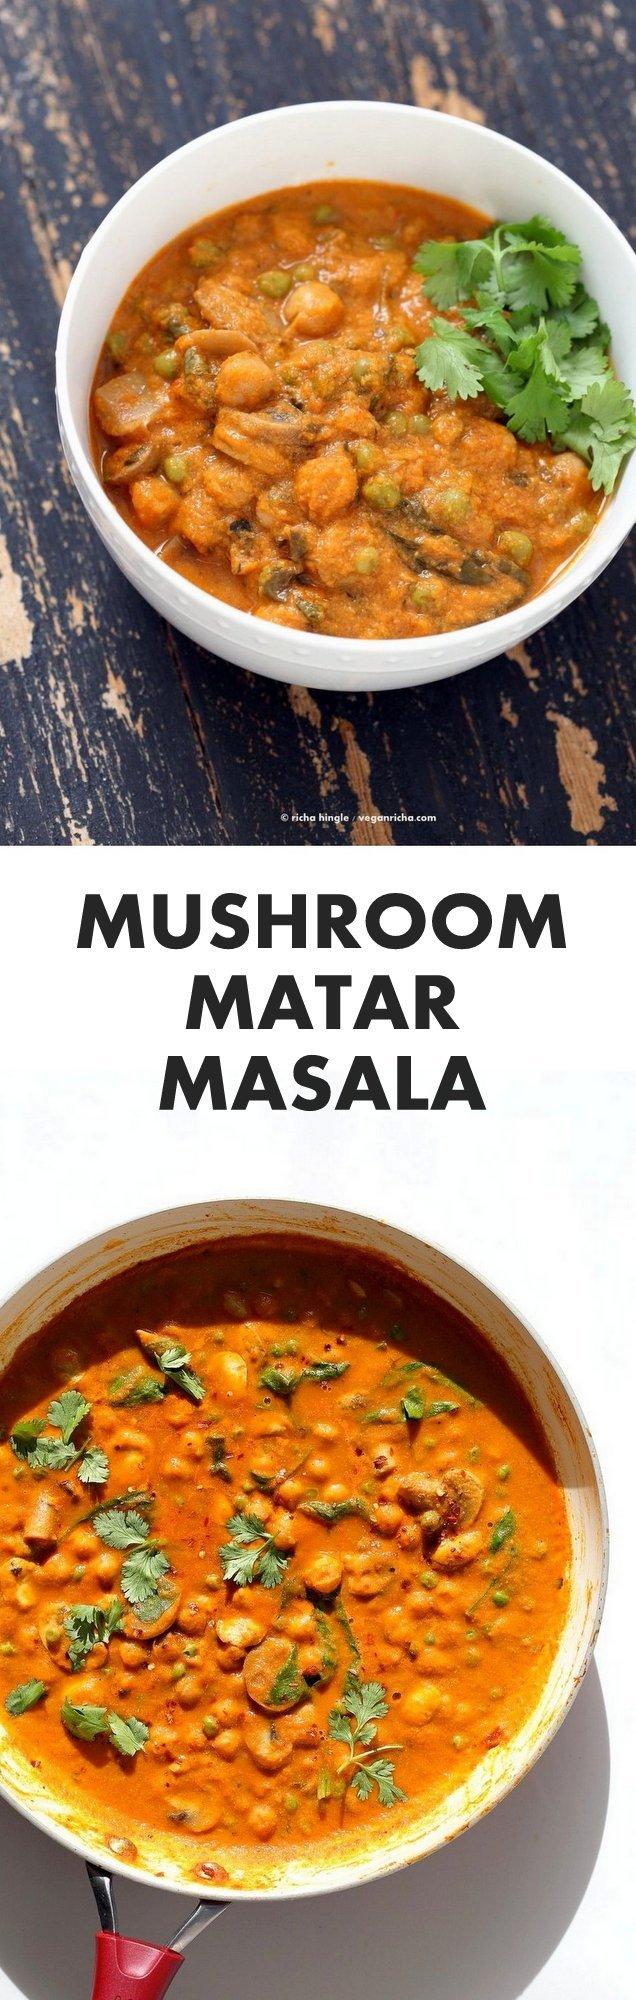 Mushroom Matar Masala. Mushrooms Peas Spinach in creamy tomato sauce. Mushroom Masala Recipe with Easy Blender Masala Sauce. Vegan Indian Gluten-free Soy-free | VeganRicha.com